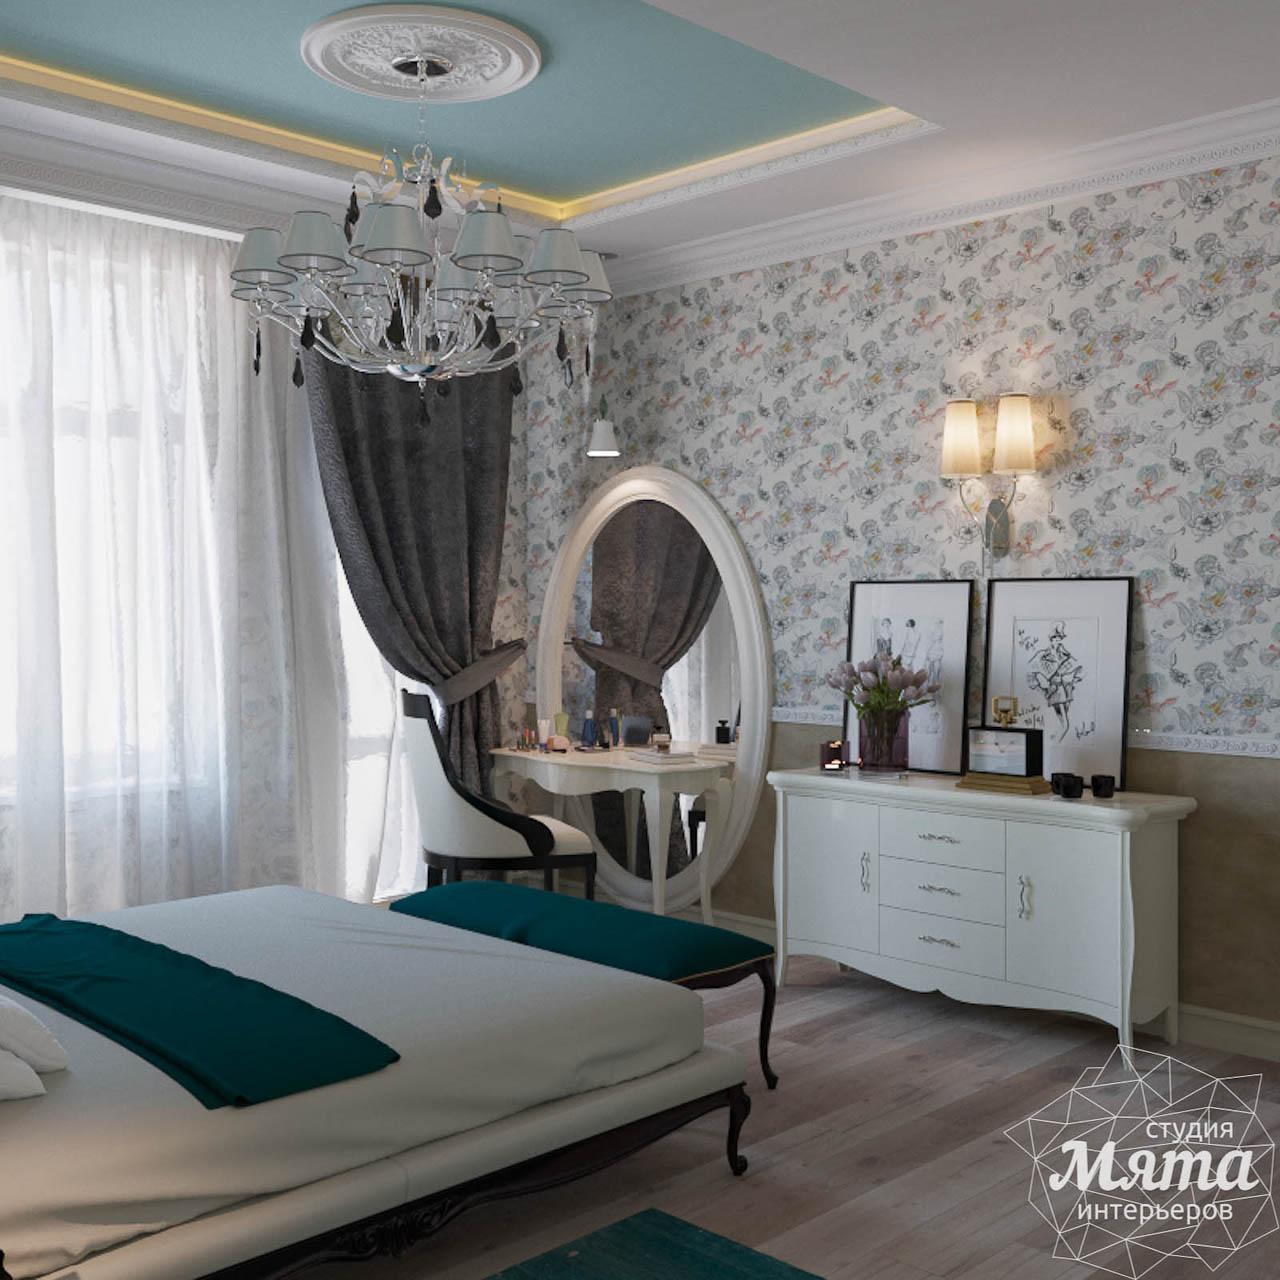 Дизайн интерьера и ремонт трехкомнатной квартиры в Карасьозерском 2 img2045536302